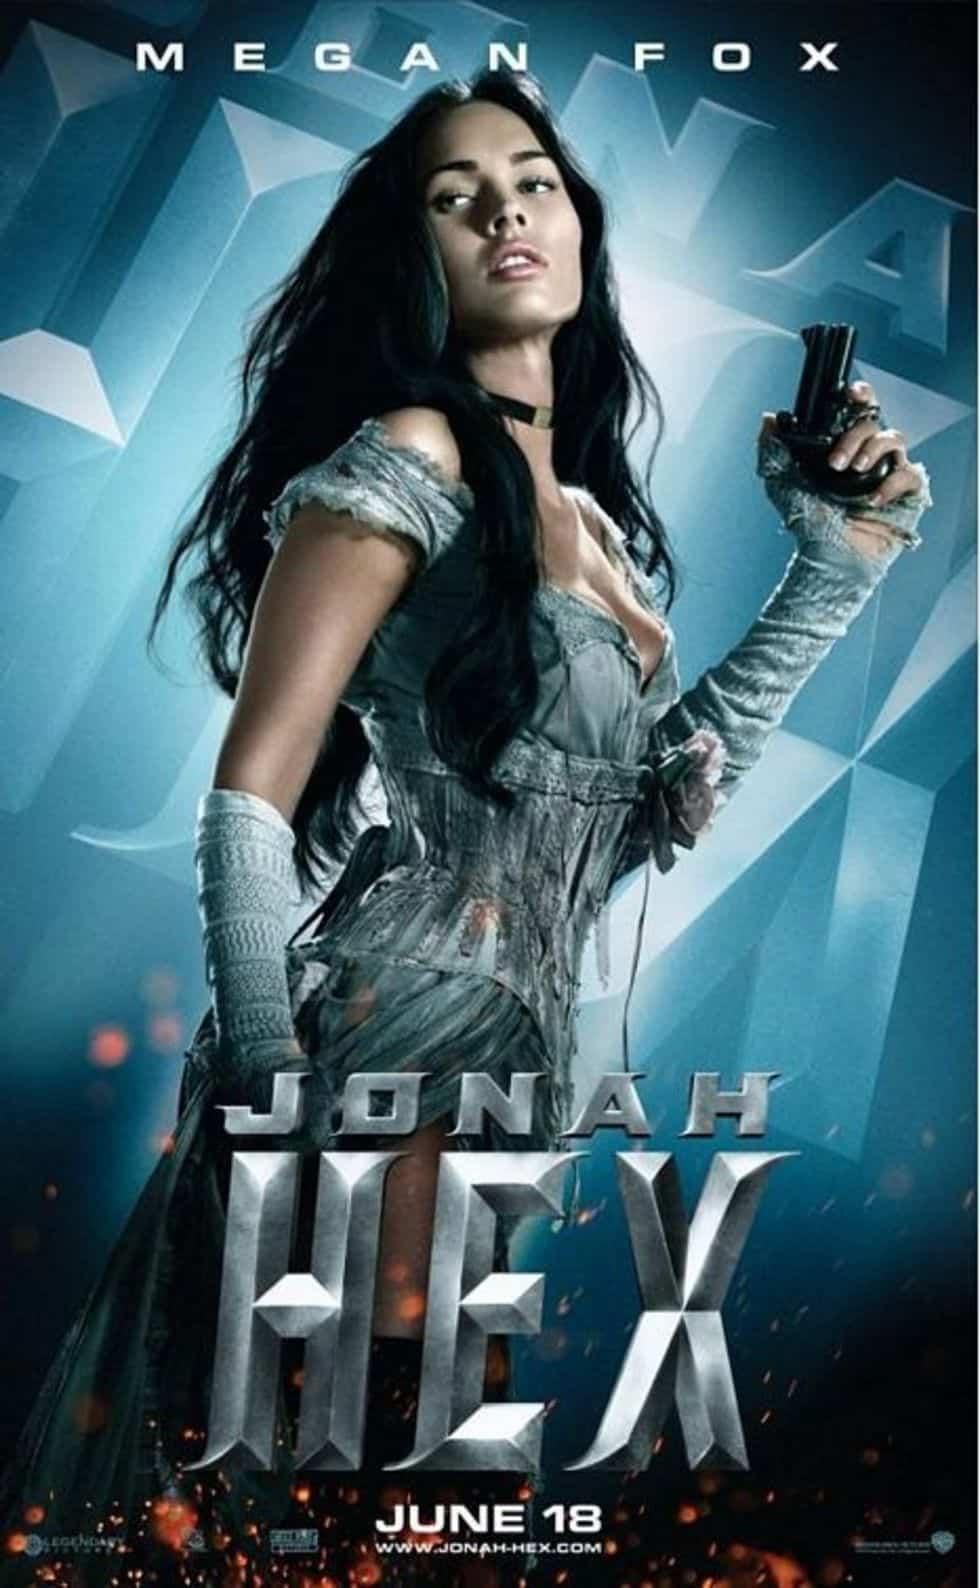 Jona hex poster